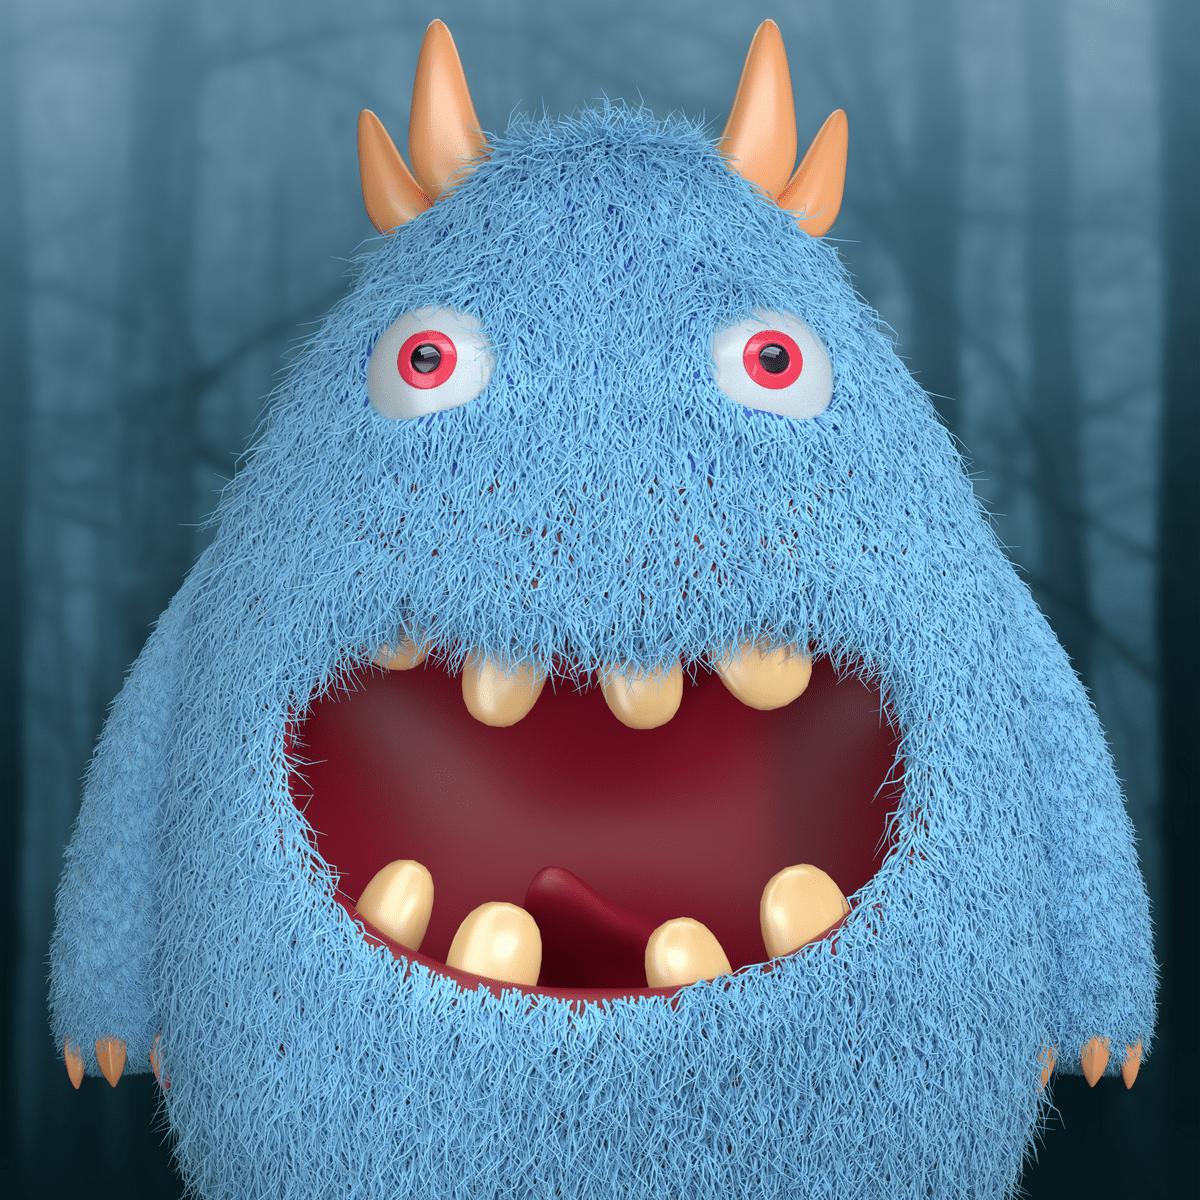 a blue monster 3d character